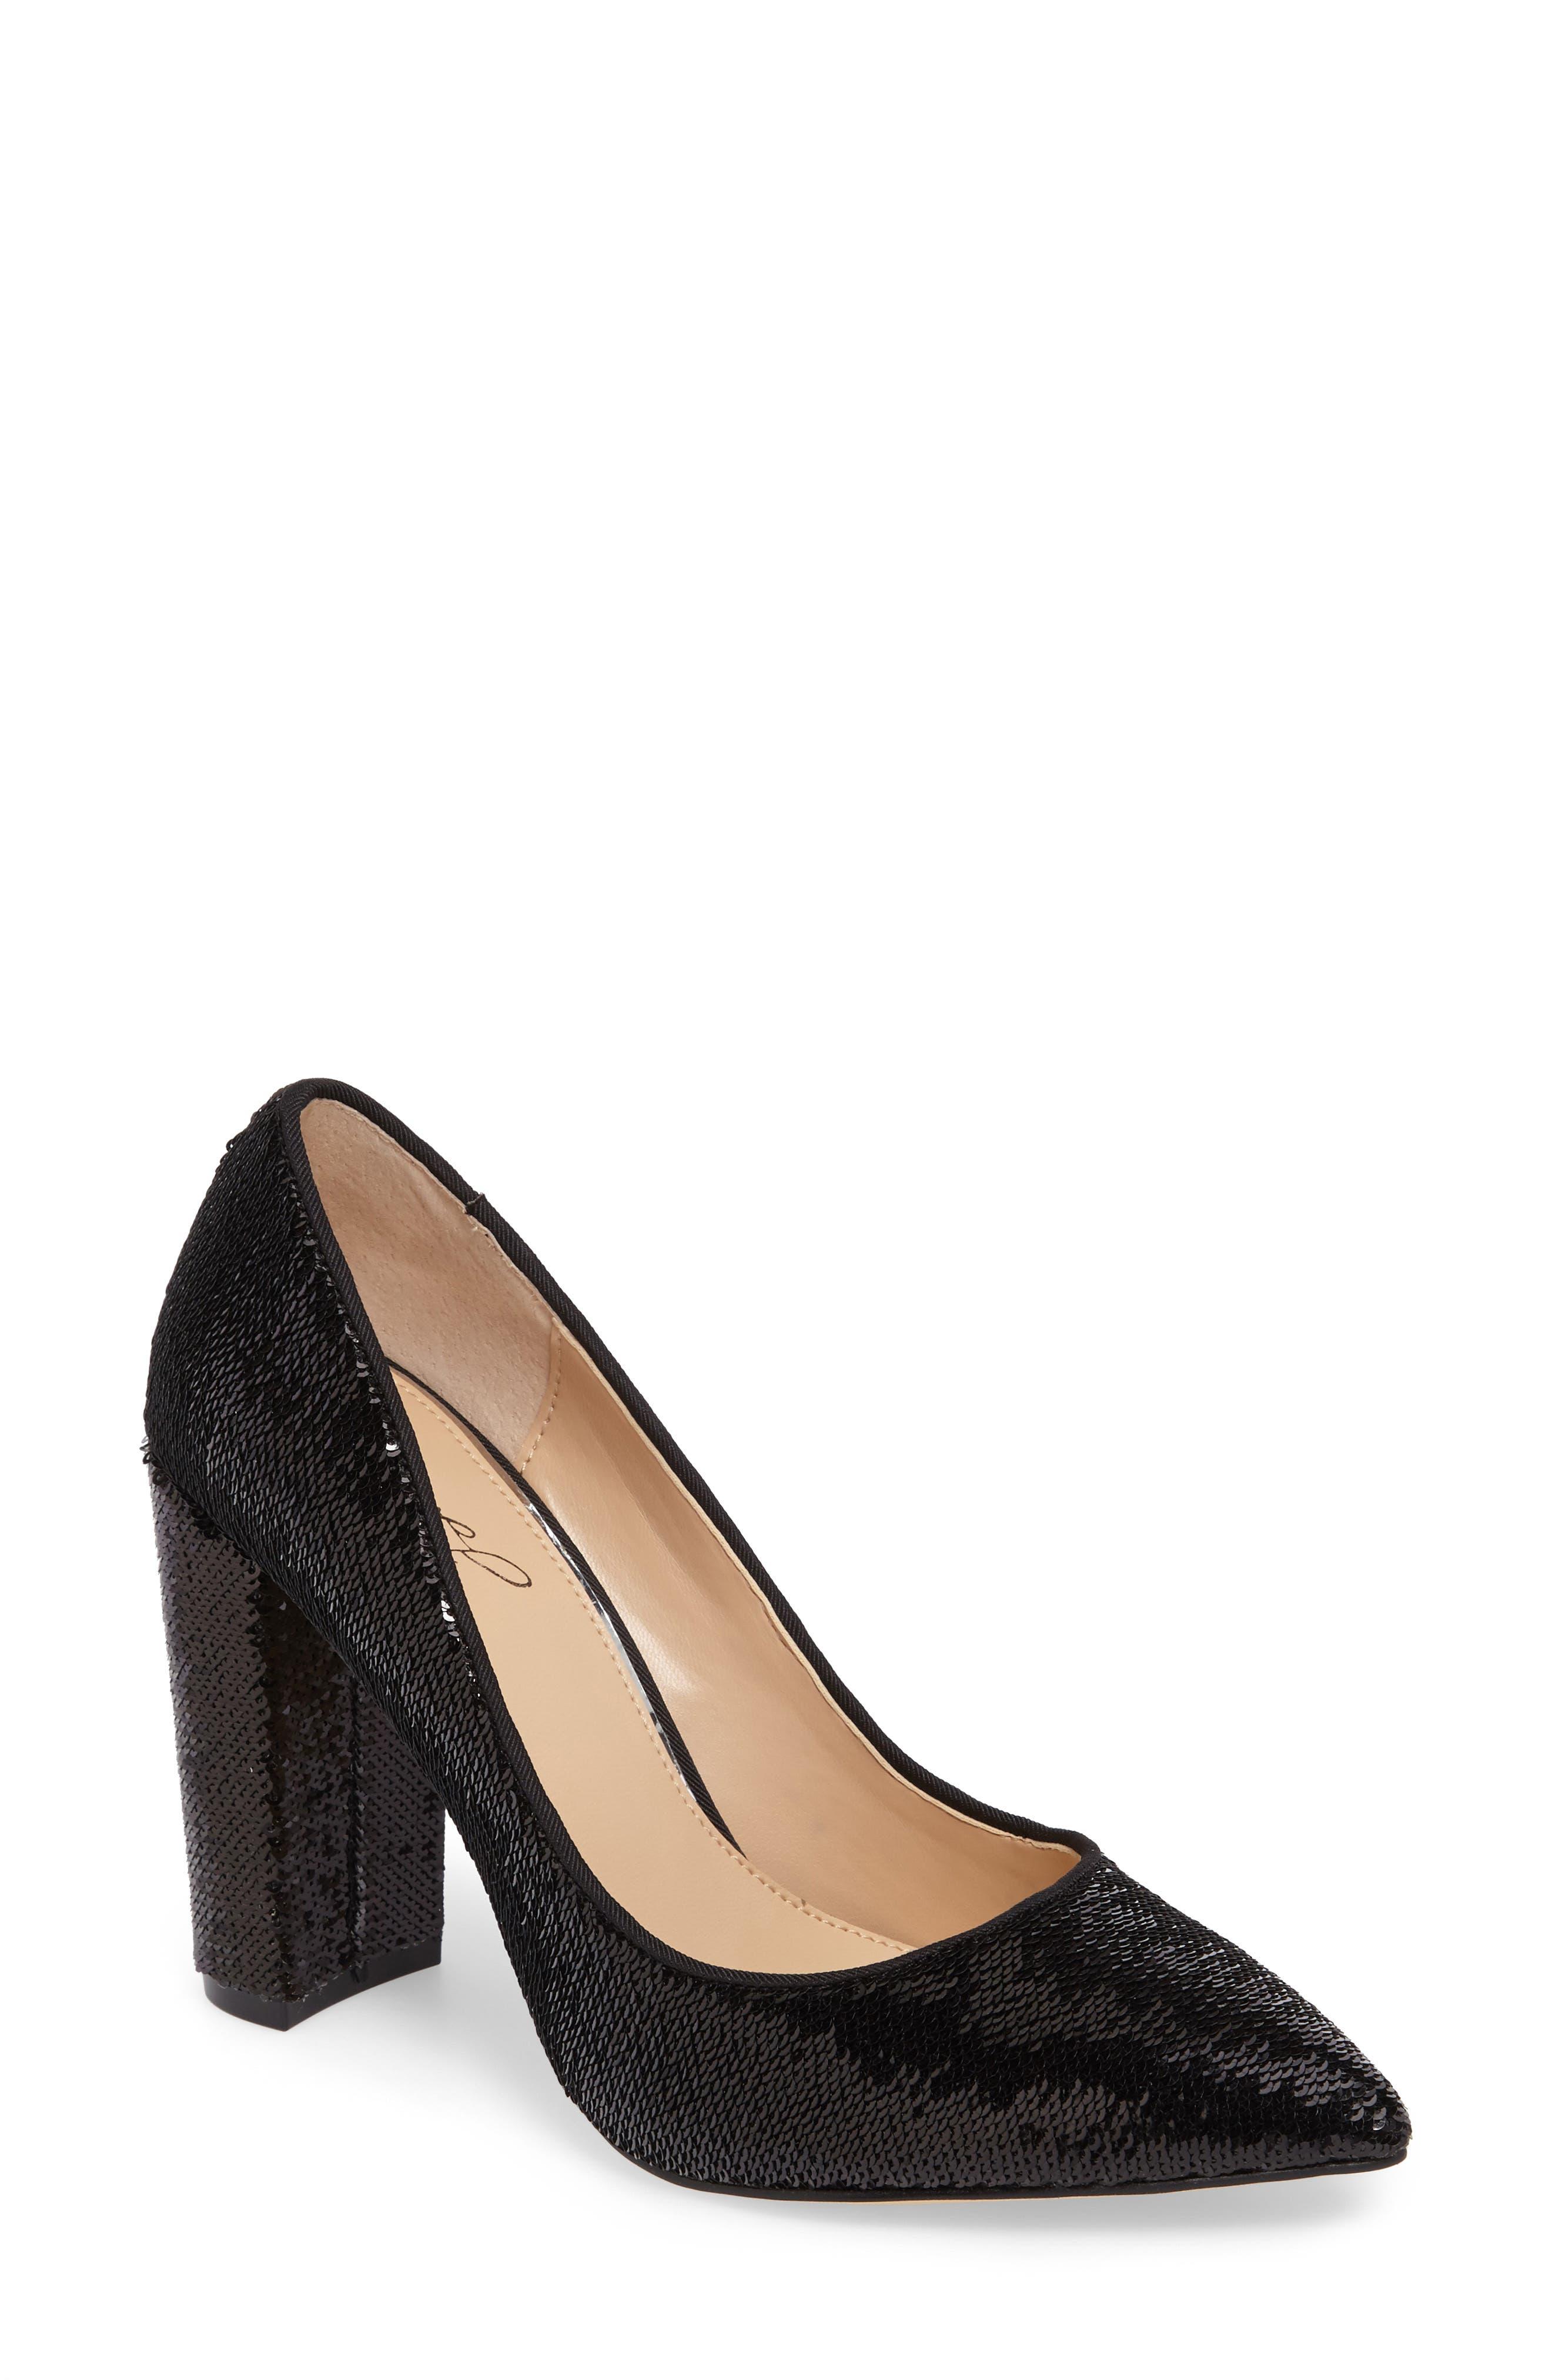 Main Image - Jewel Badgley Mischka Luxury Pointy Toe Pump (Women)